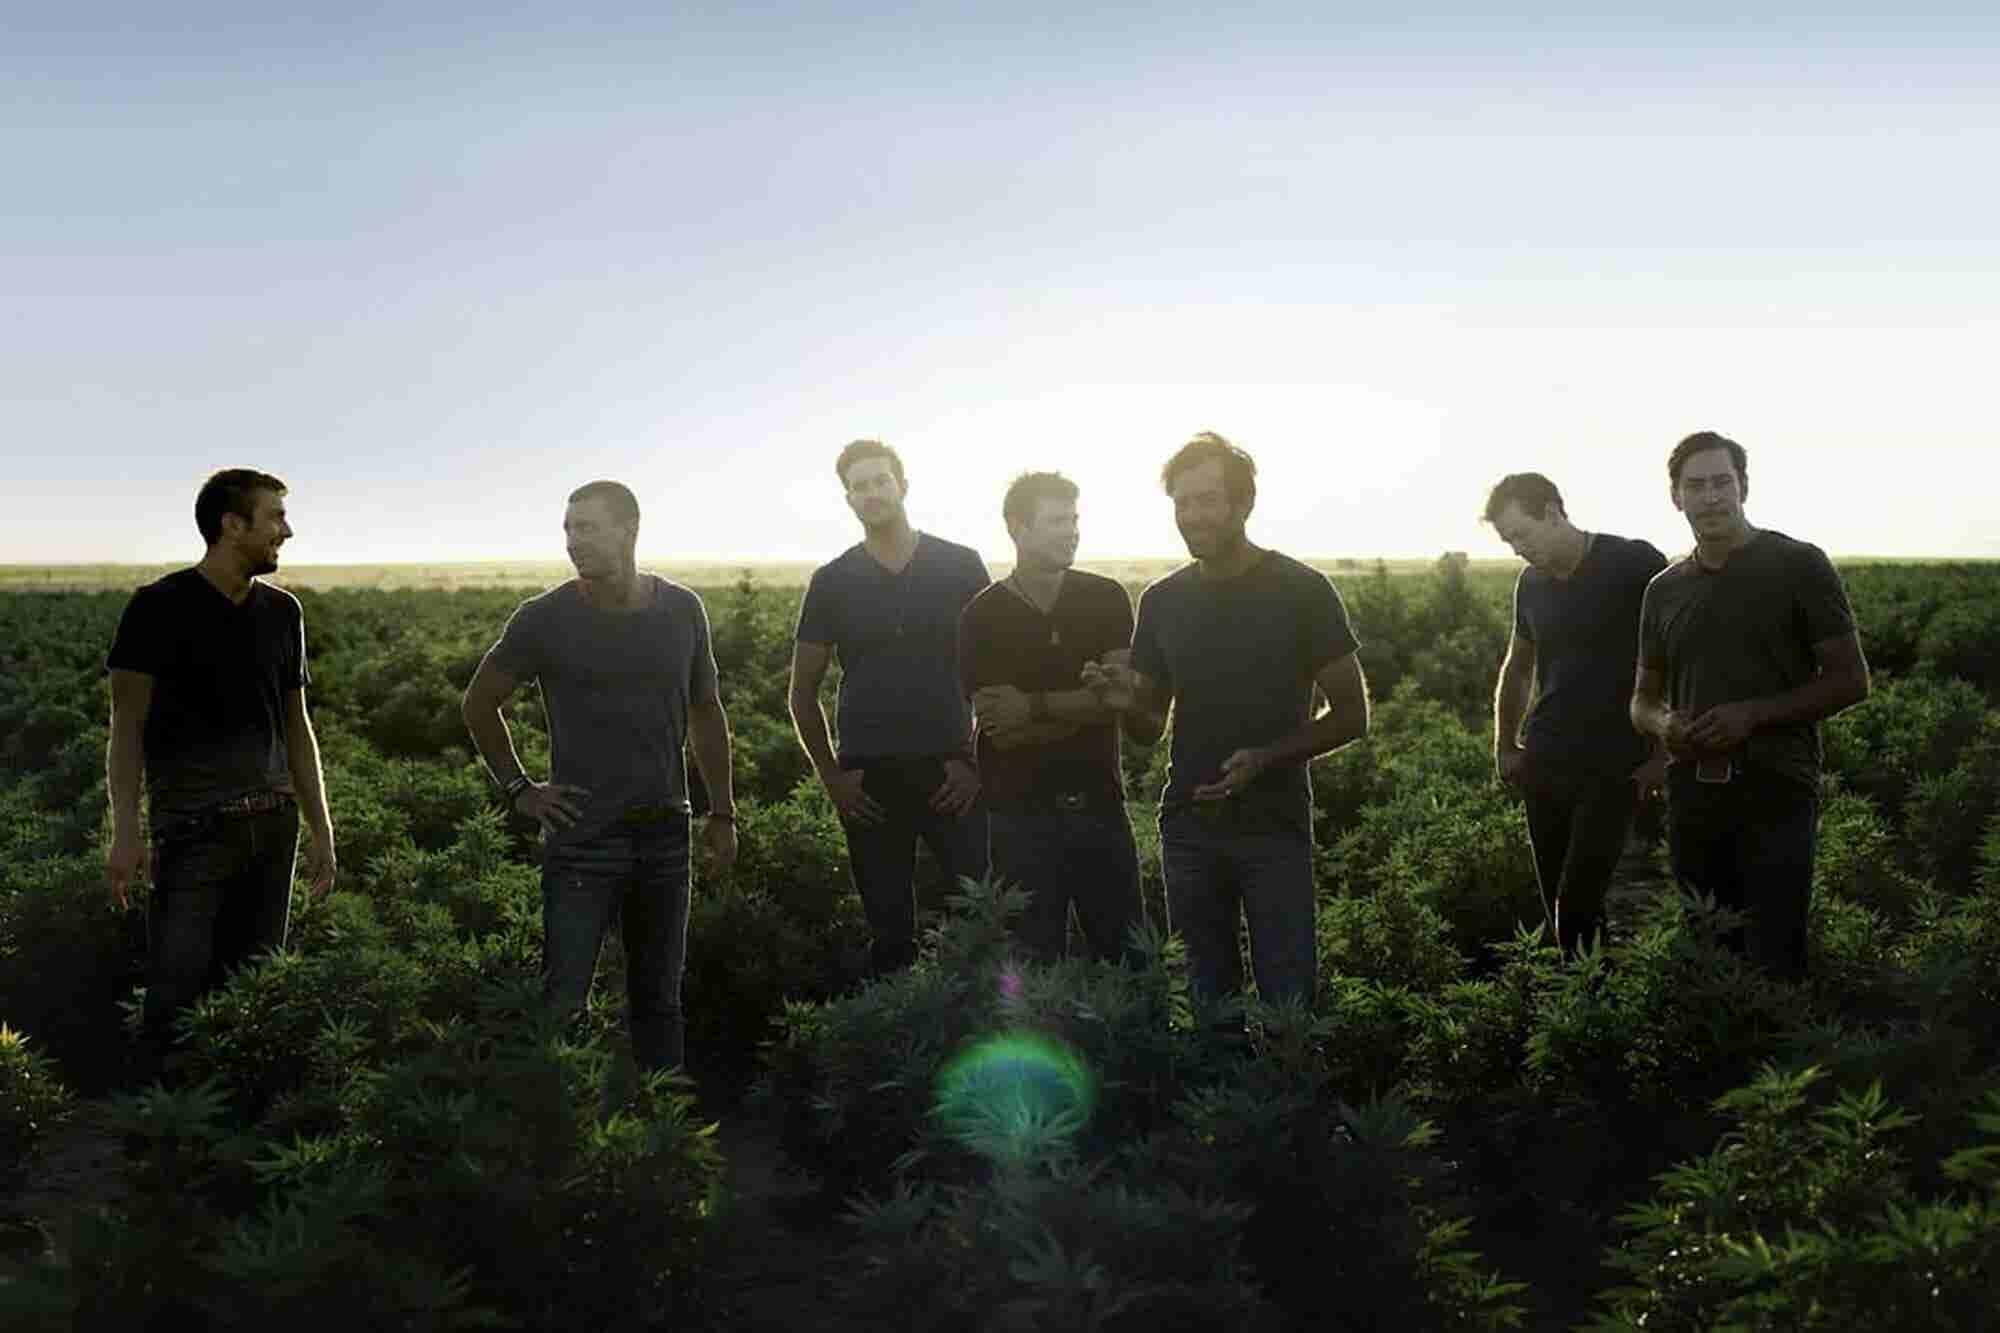 How 7 Brothers Became Pioneers in Hemp-Based CBD